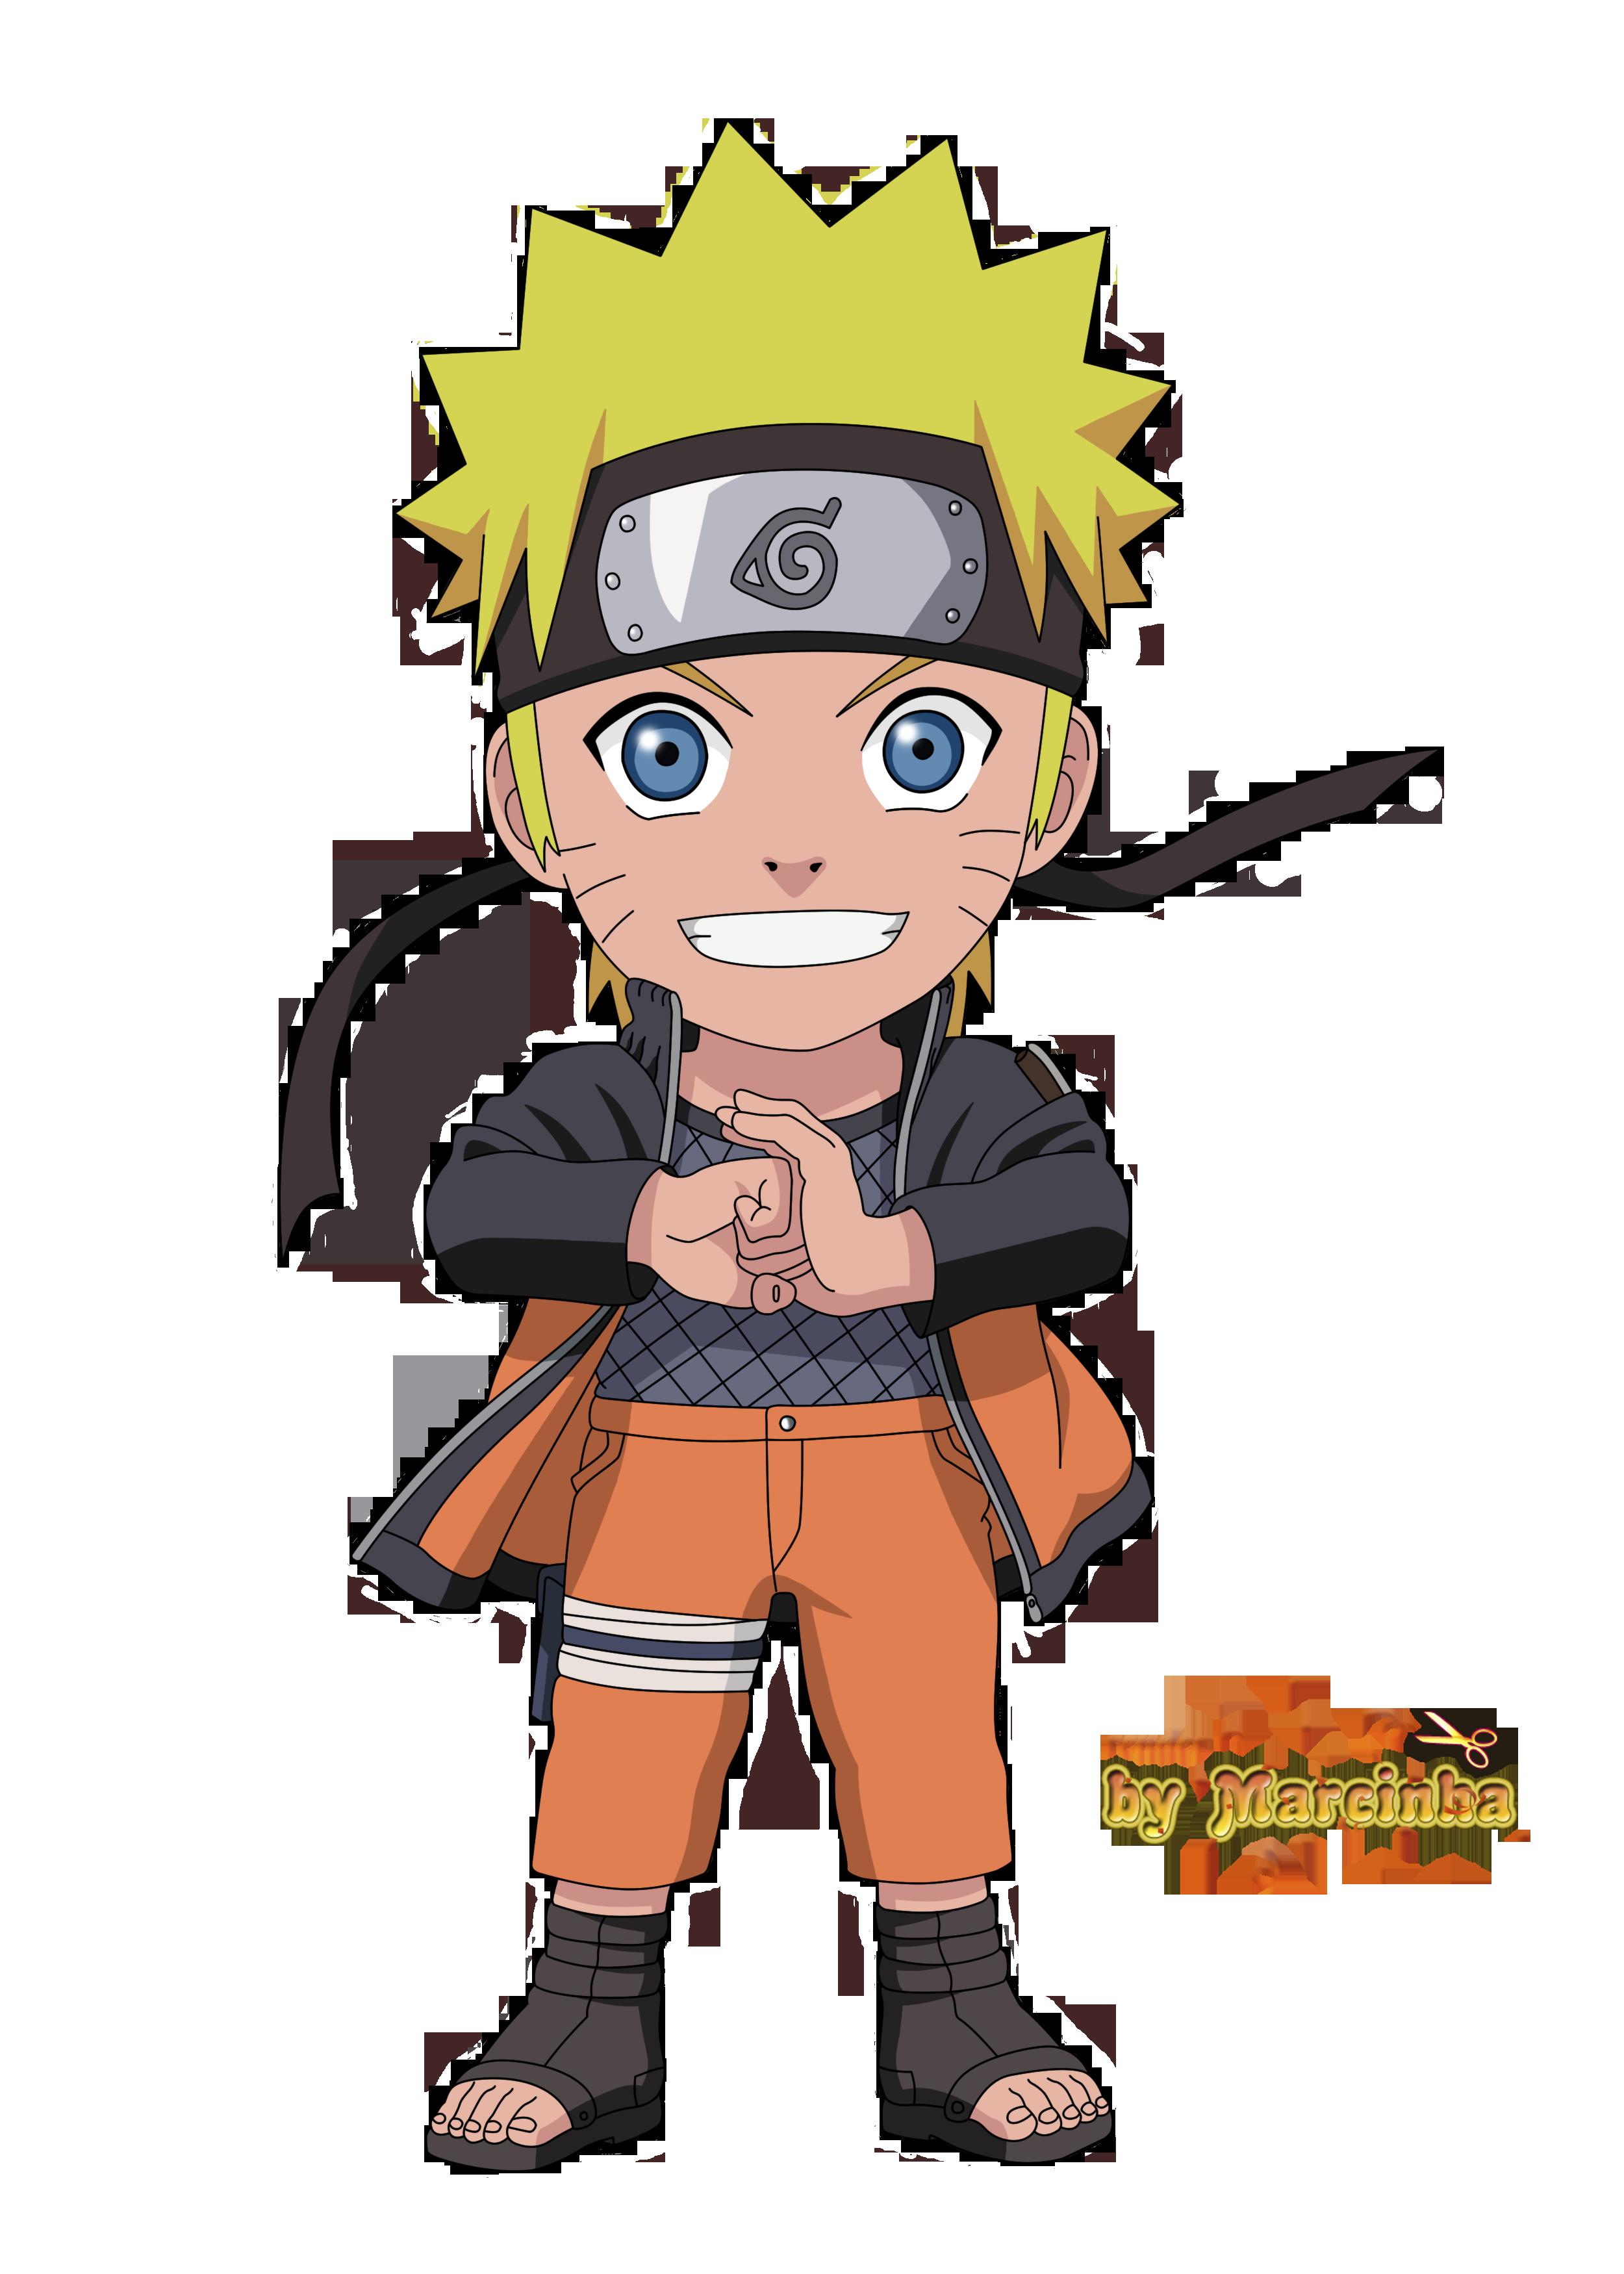 Naruto clipart naruto shippuden Shippuden Chibi Chibi Marcinha20 Marcinha20